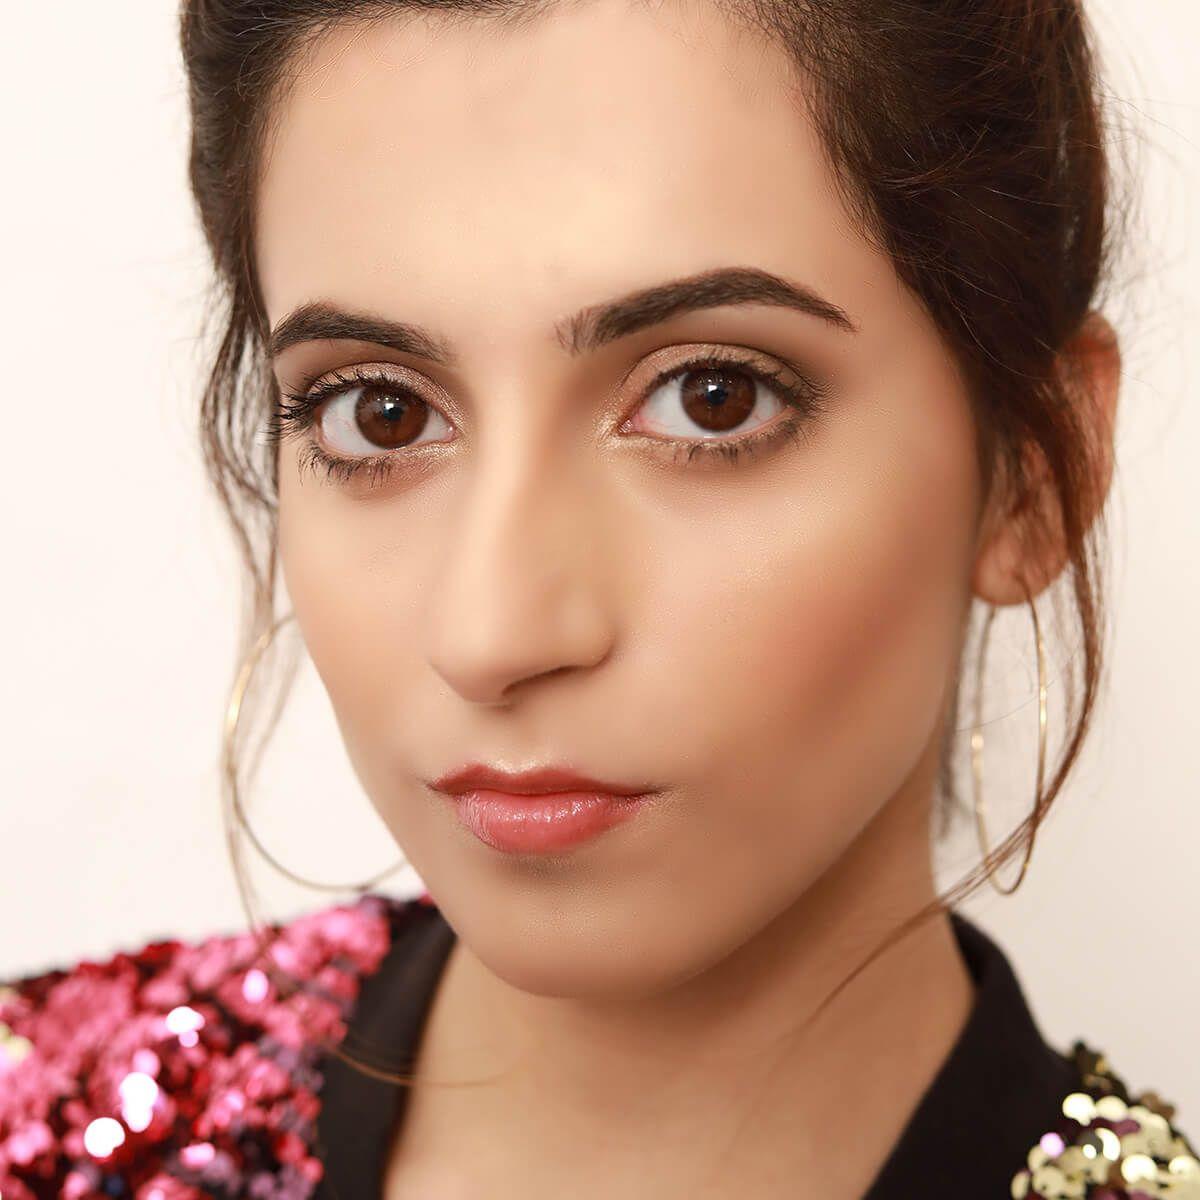 Gloss & Shine Makeup Look -  Glossy Lips & Bold Brows